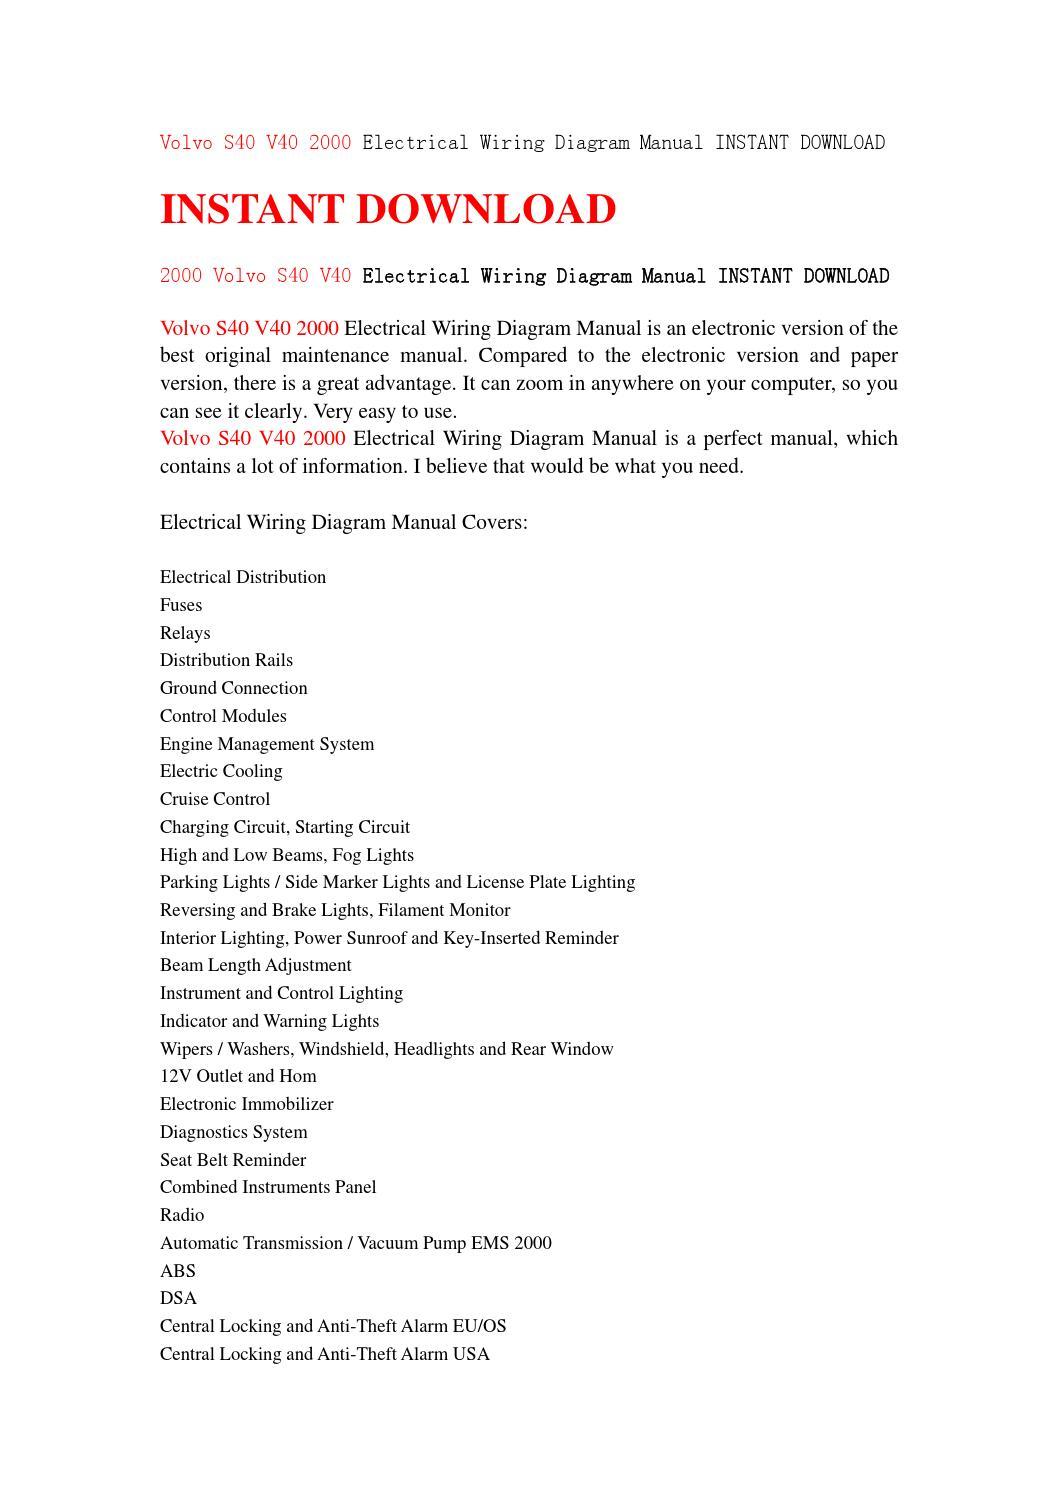 Volvo S40 V40 2000 Electrical Wiring Diagram Manual